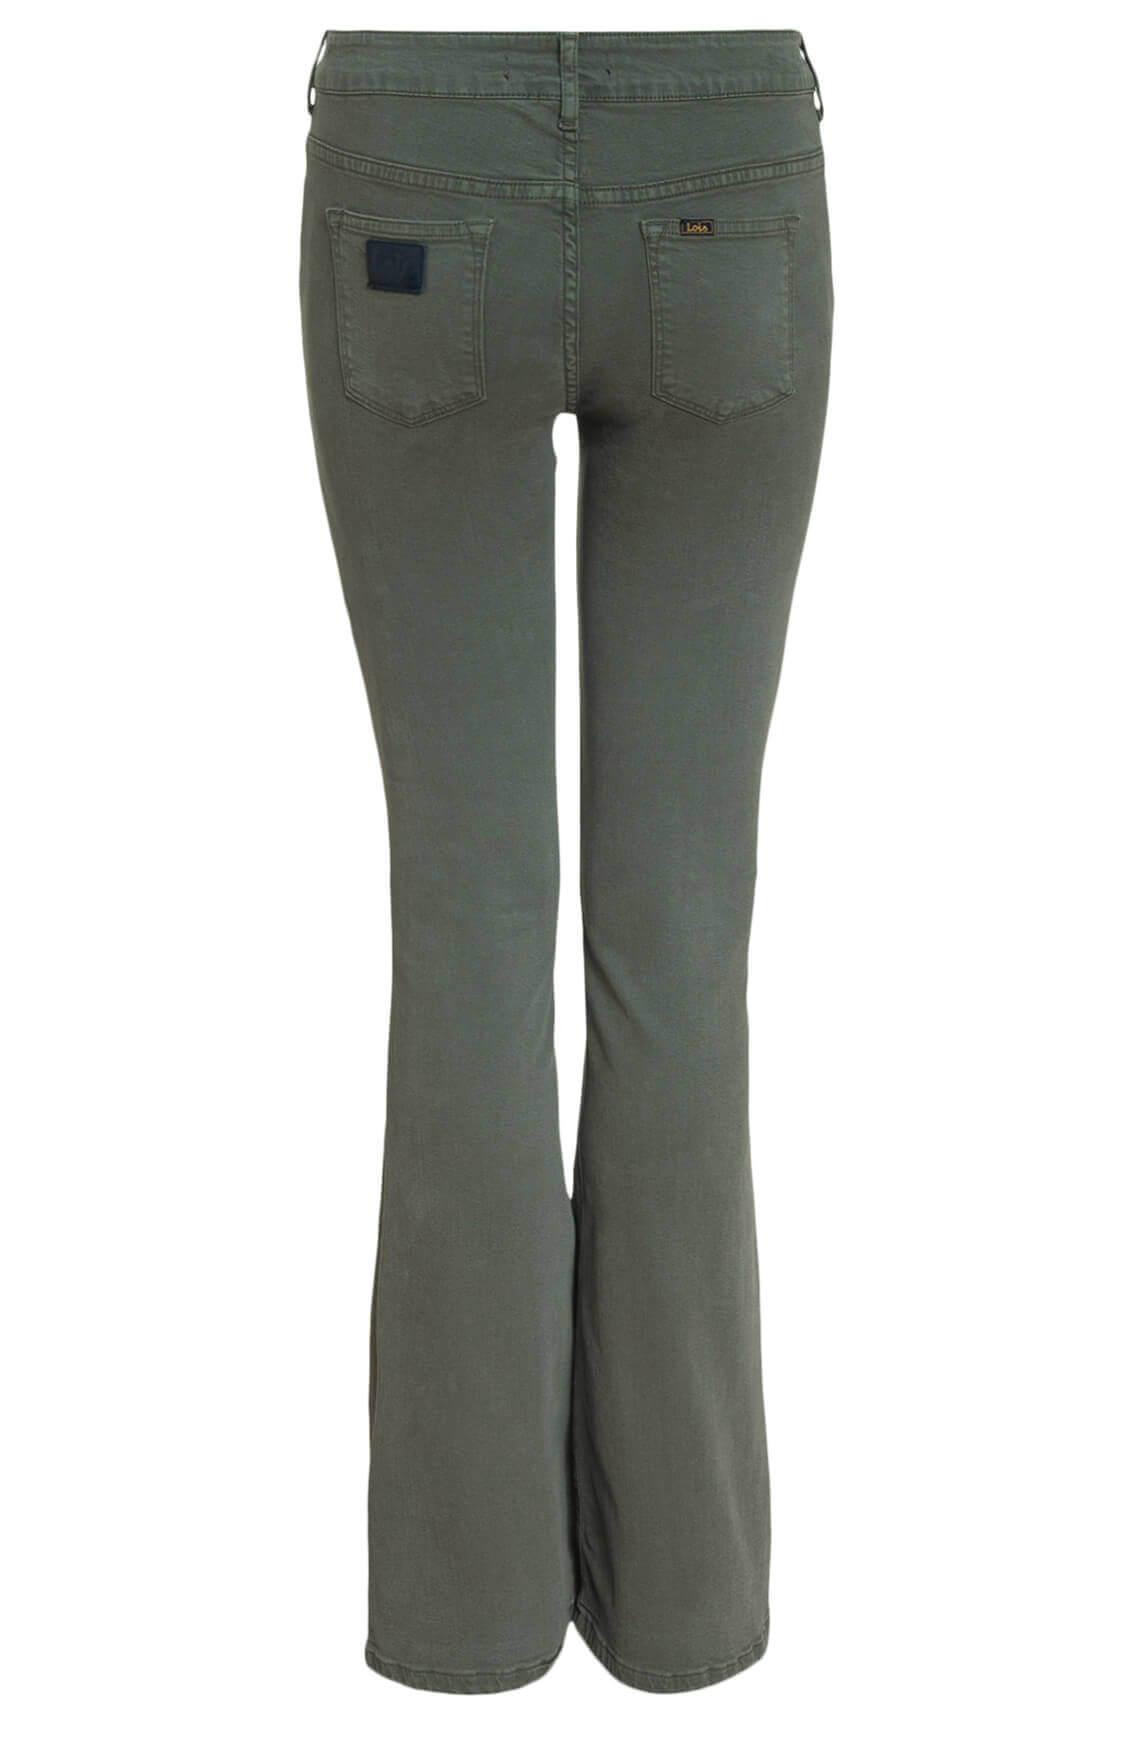 Lois Dames L34 Megalia broek groen